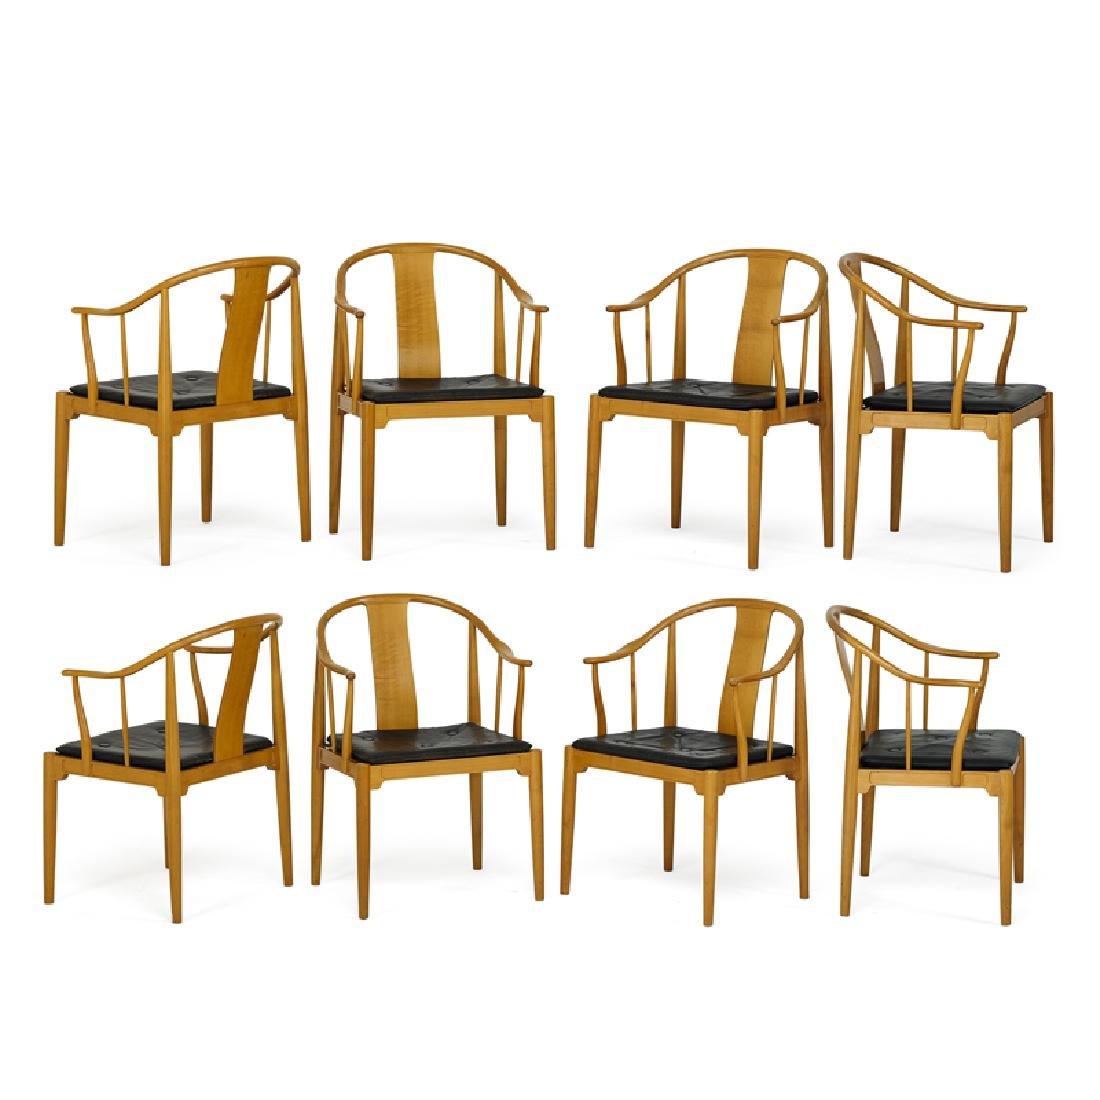 HANS WEGNER Set of eight China armchairs